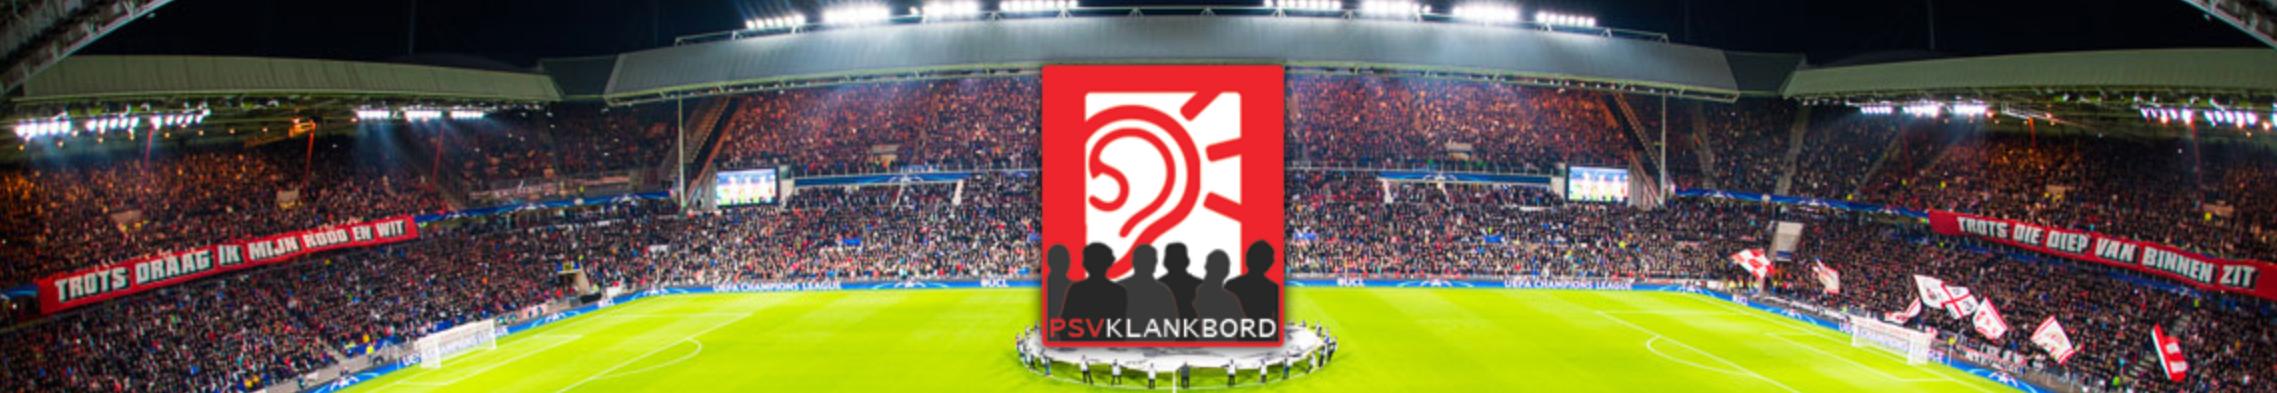 PSV Klankbord